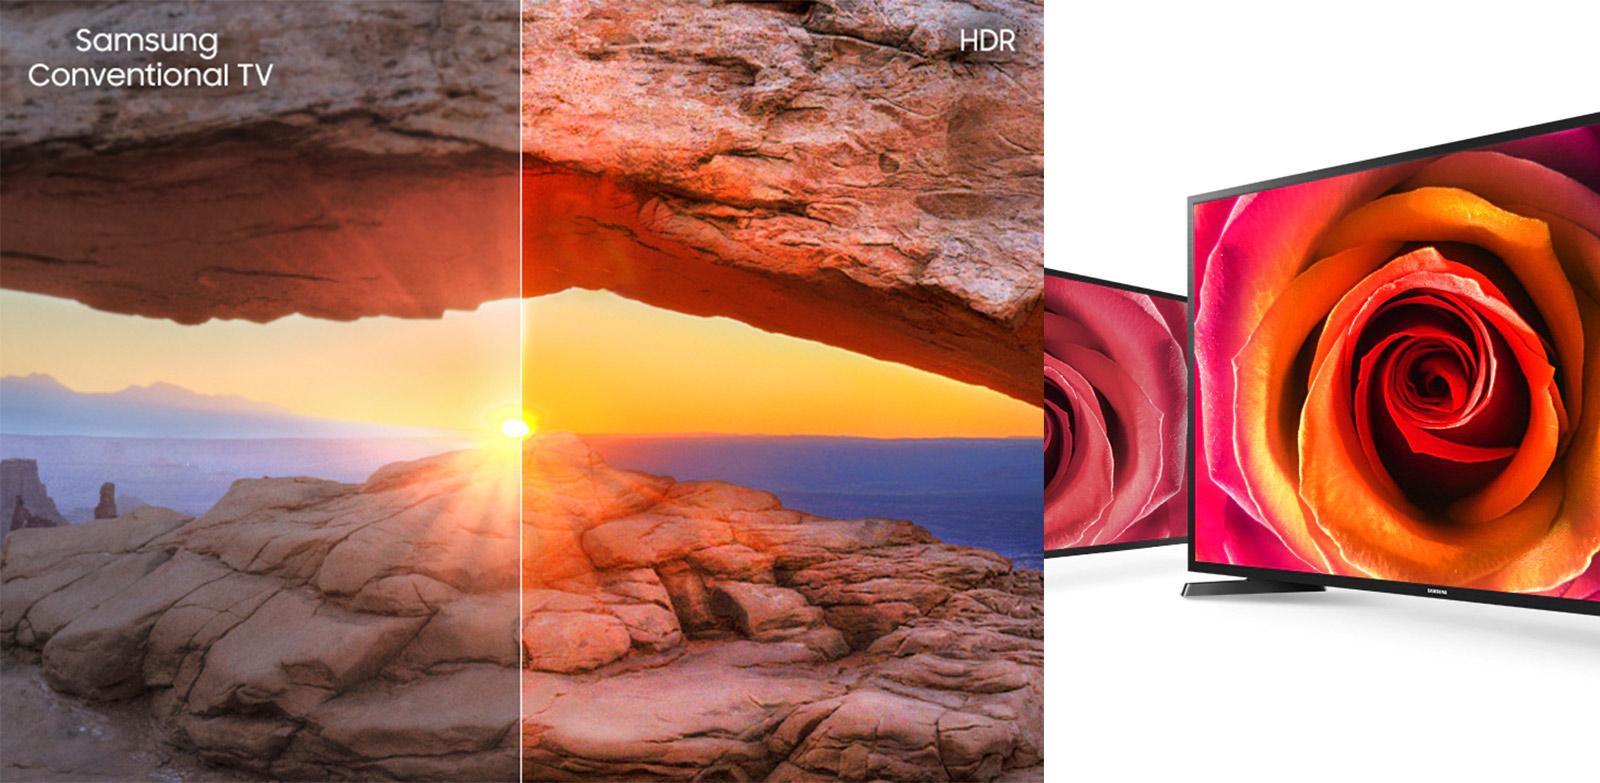 1_UA40N5300AKXXA-Extension-Images_Premium-Outlet_Paulshof_appliance_Modular